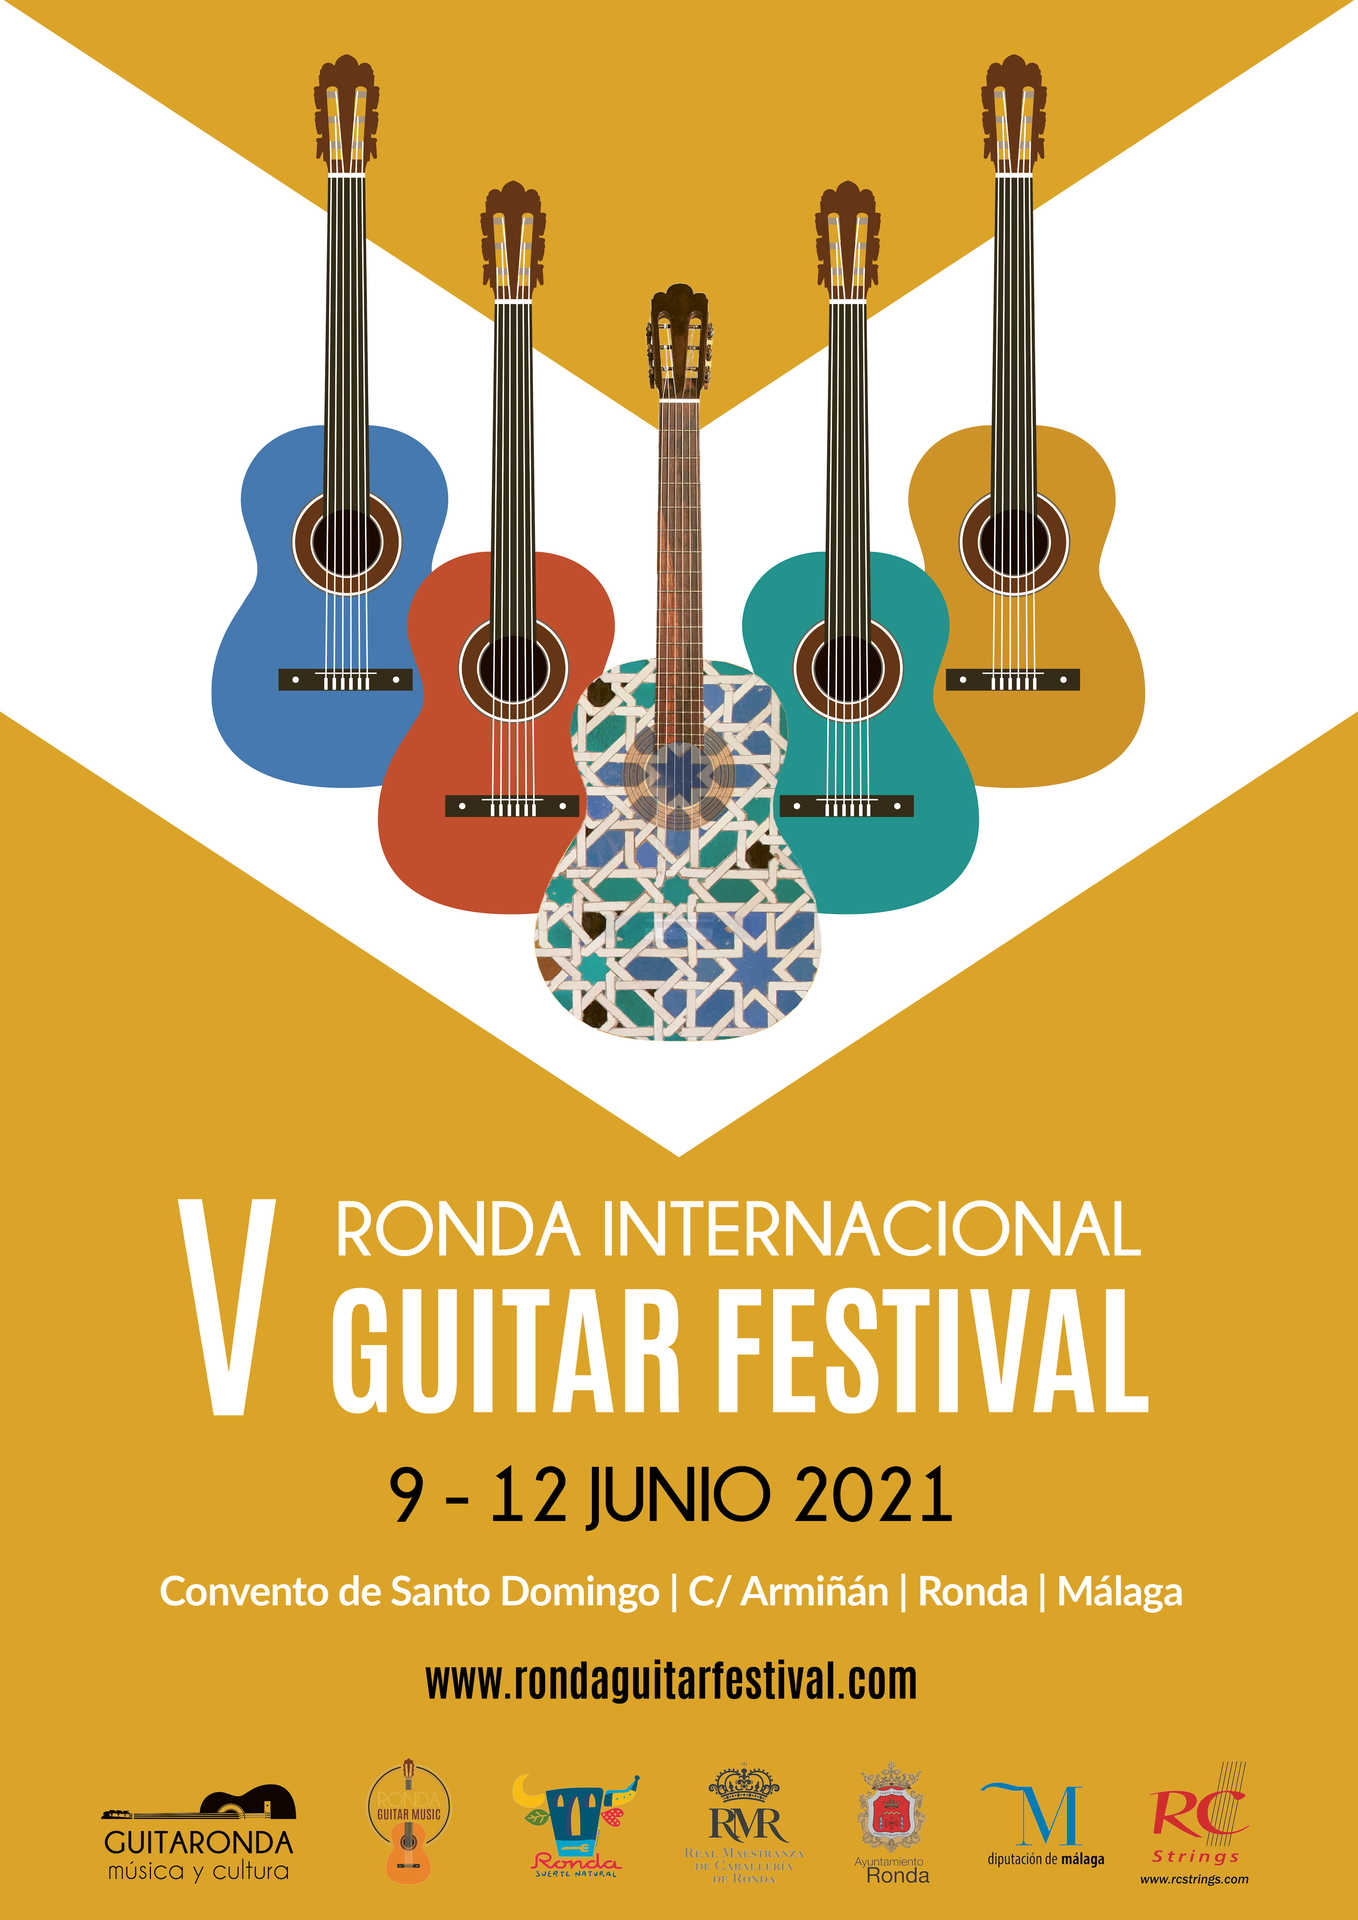 Ronda International Guitar Festival